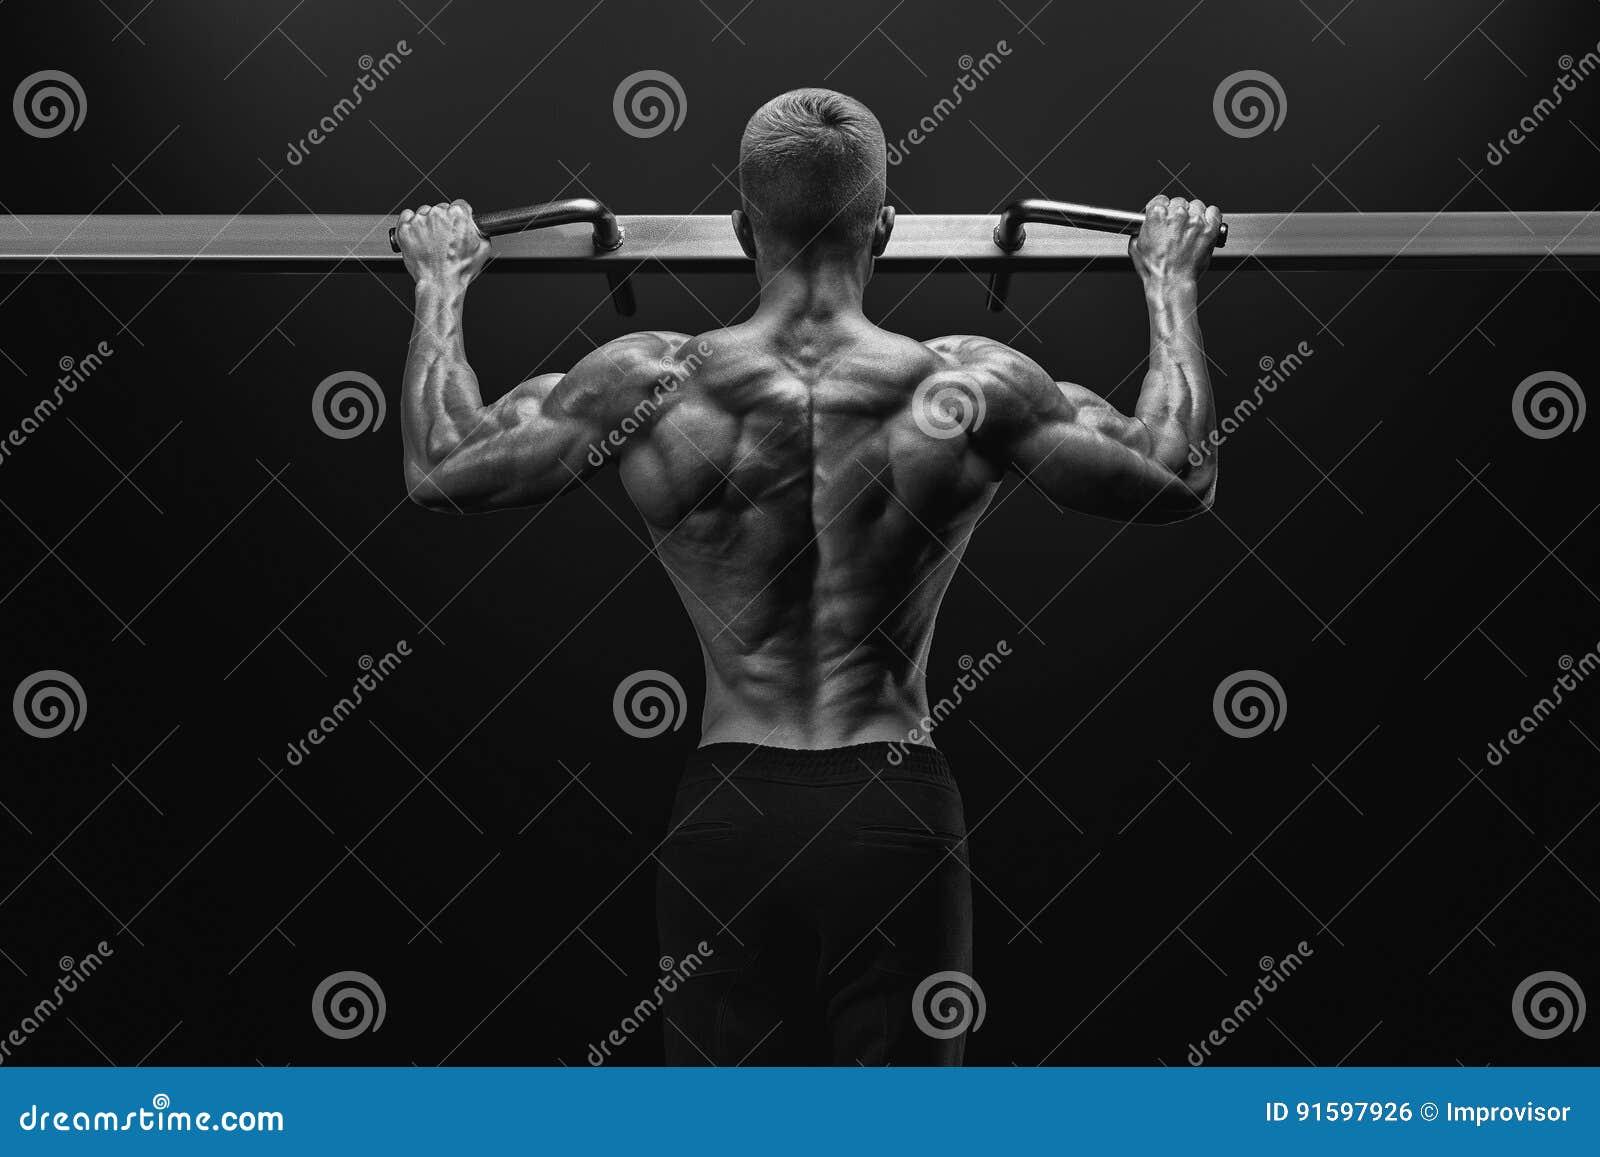 Power muscular bodybuilder guy doing pullups in gym. Fitness man